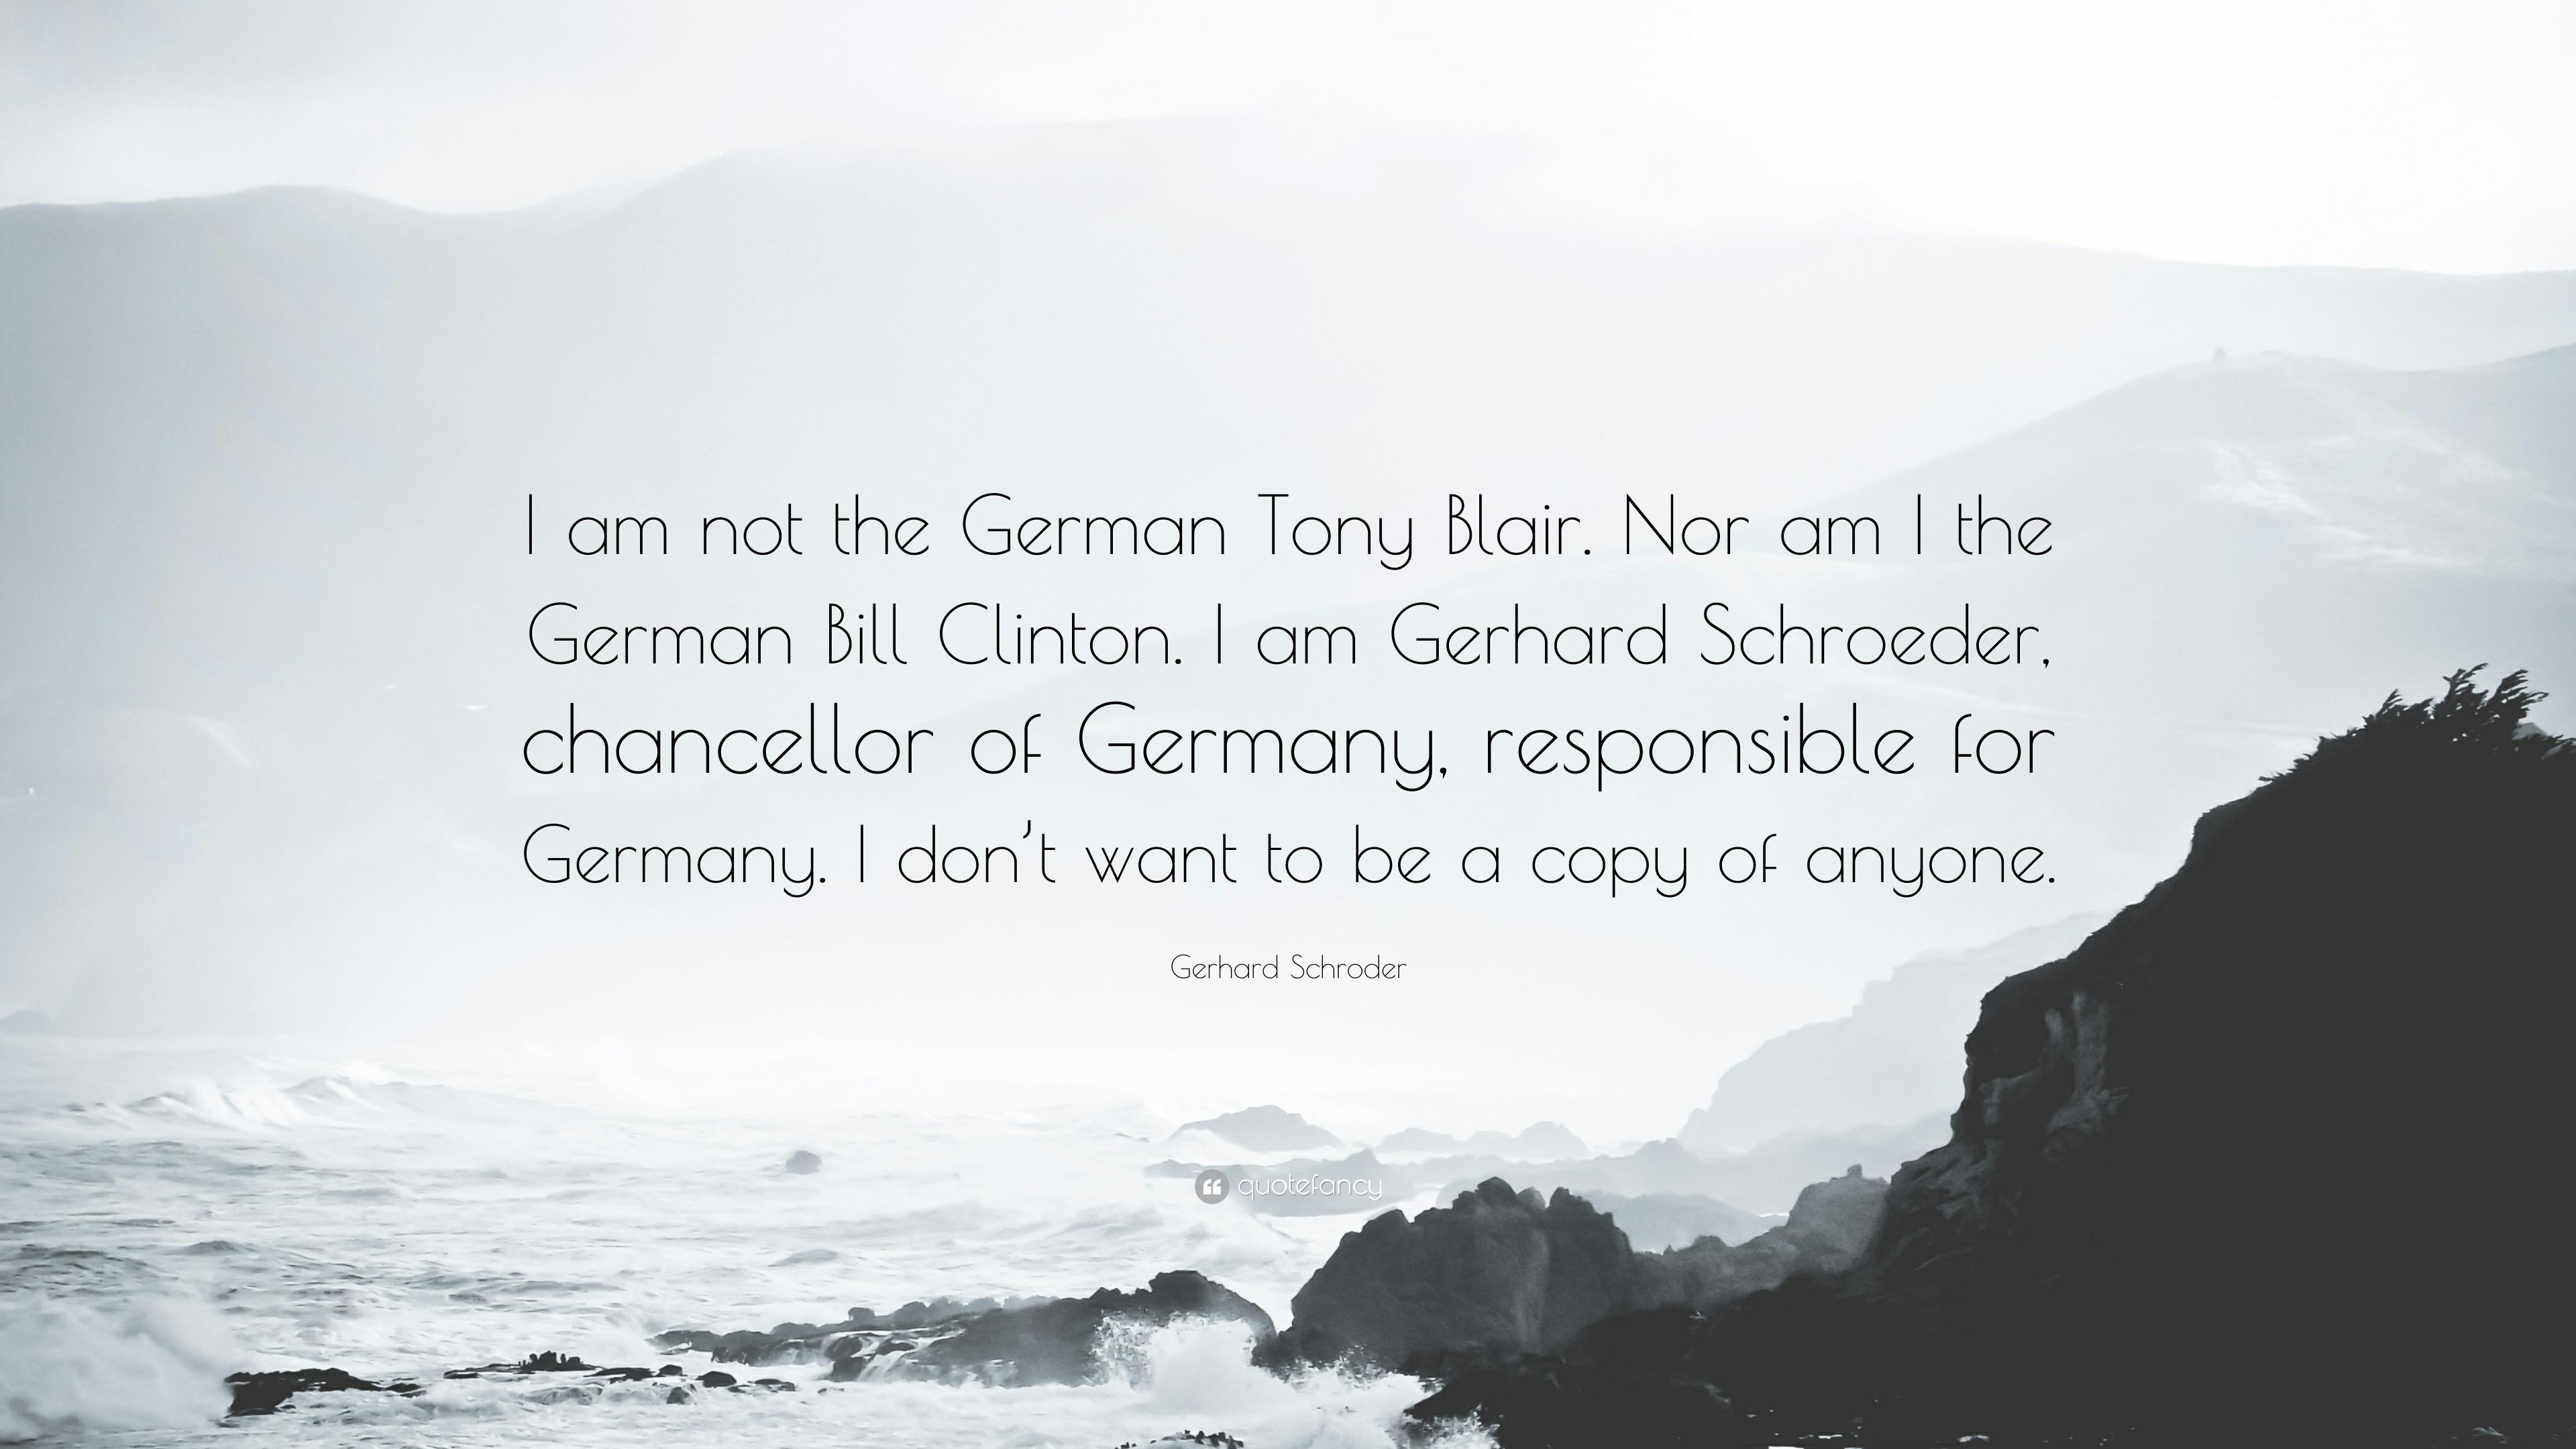 gerhard schroder quote i am not the german tony blair nor am i - Gerhard Schroder Lebenslauf